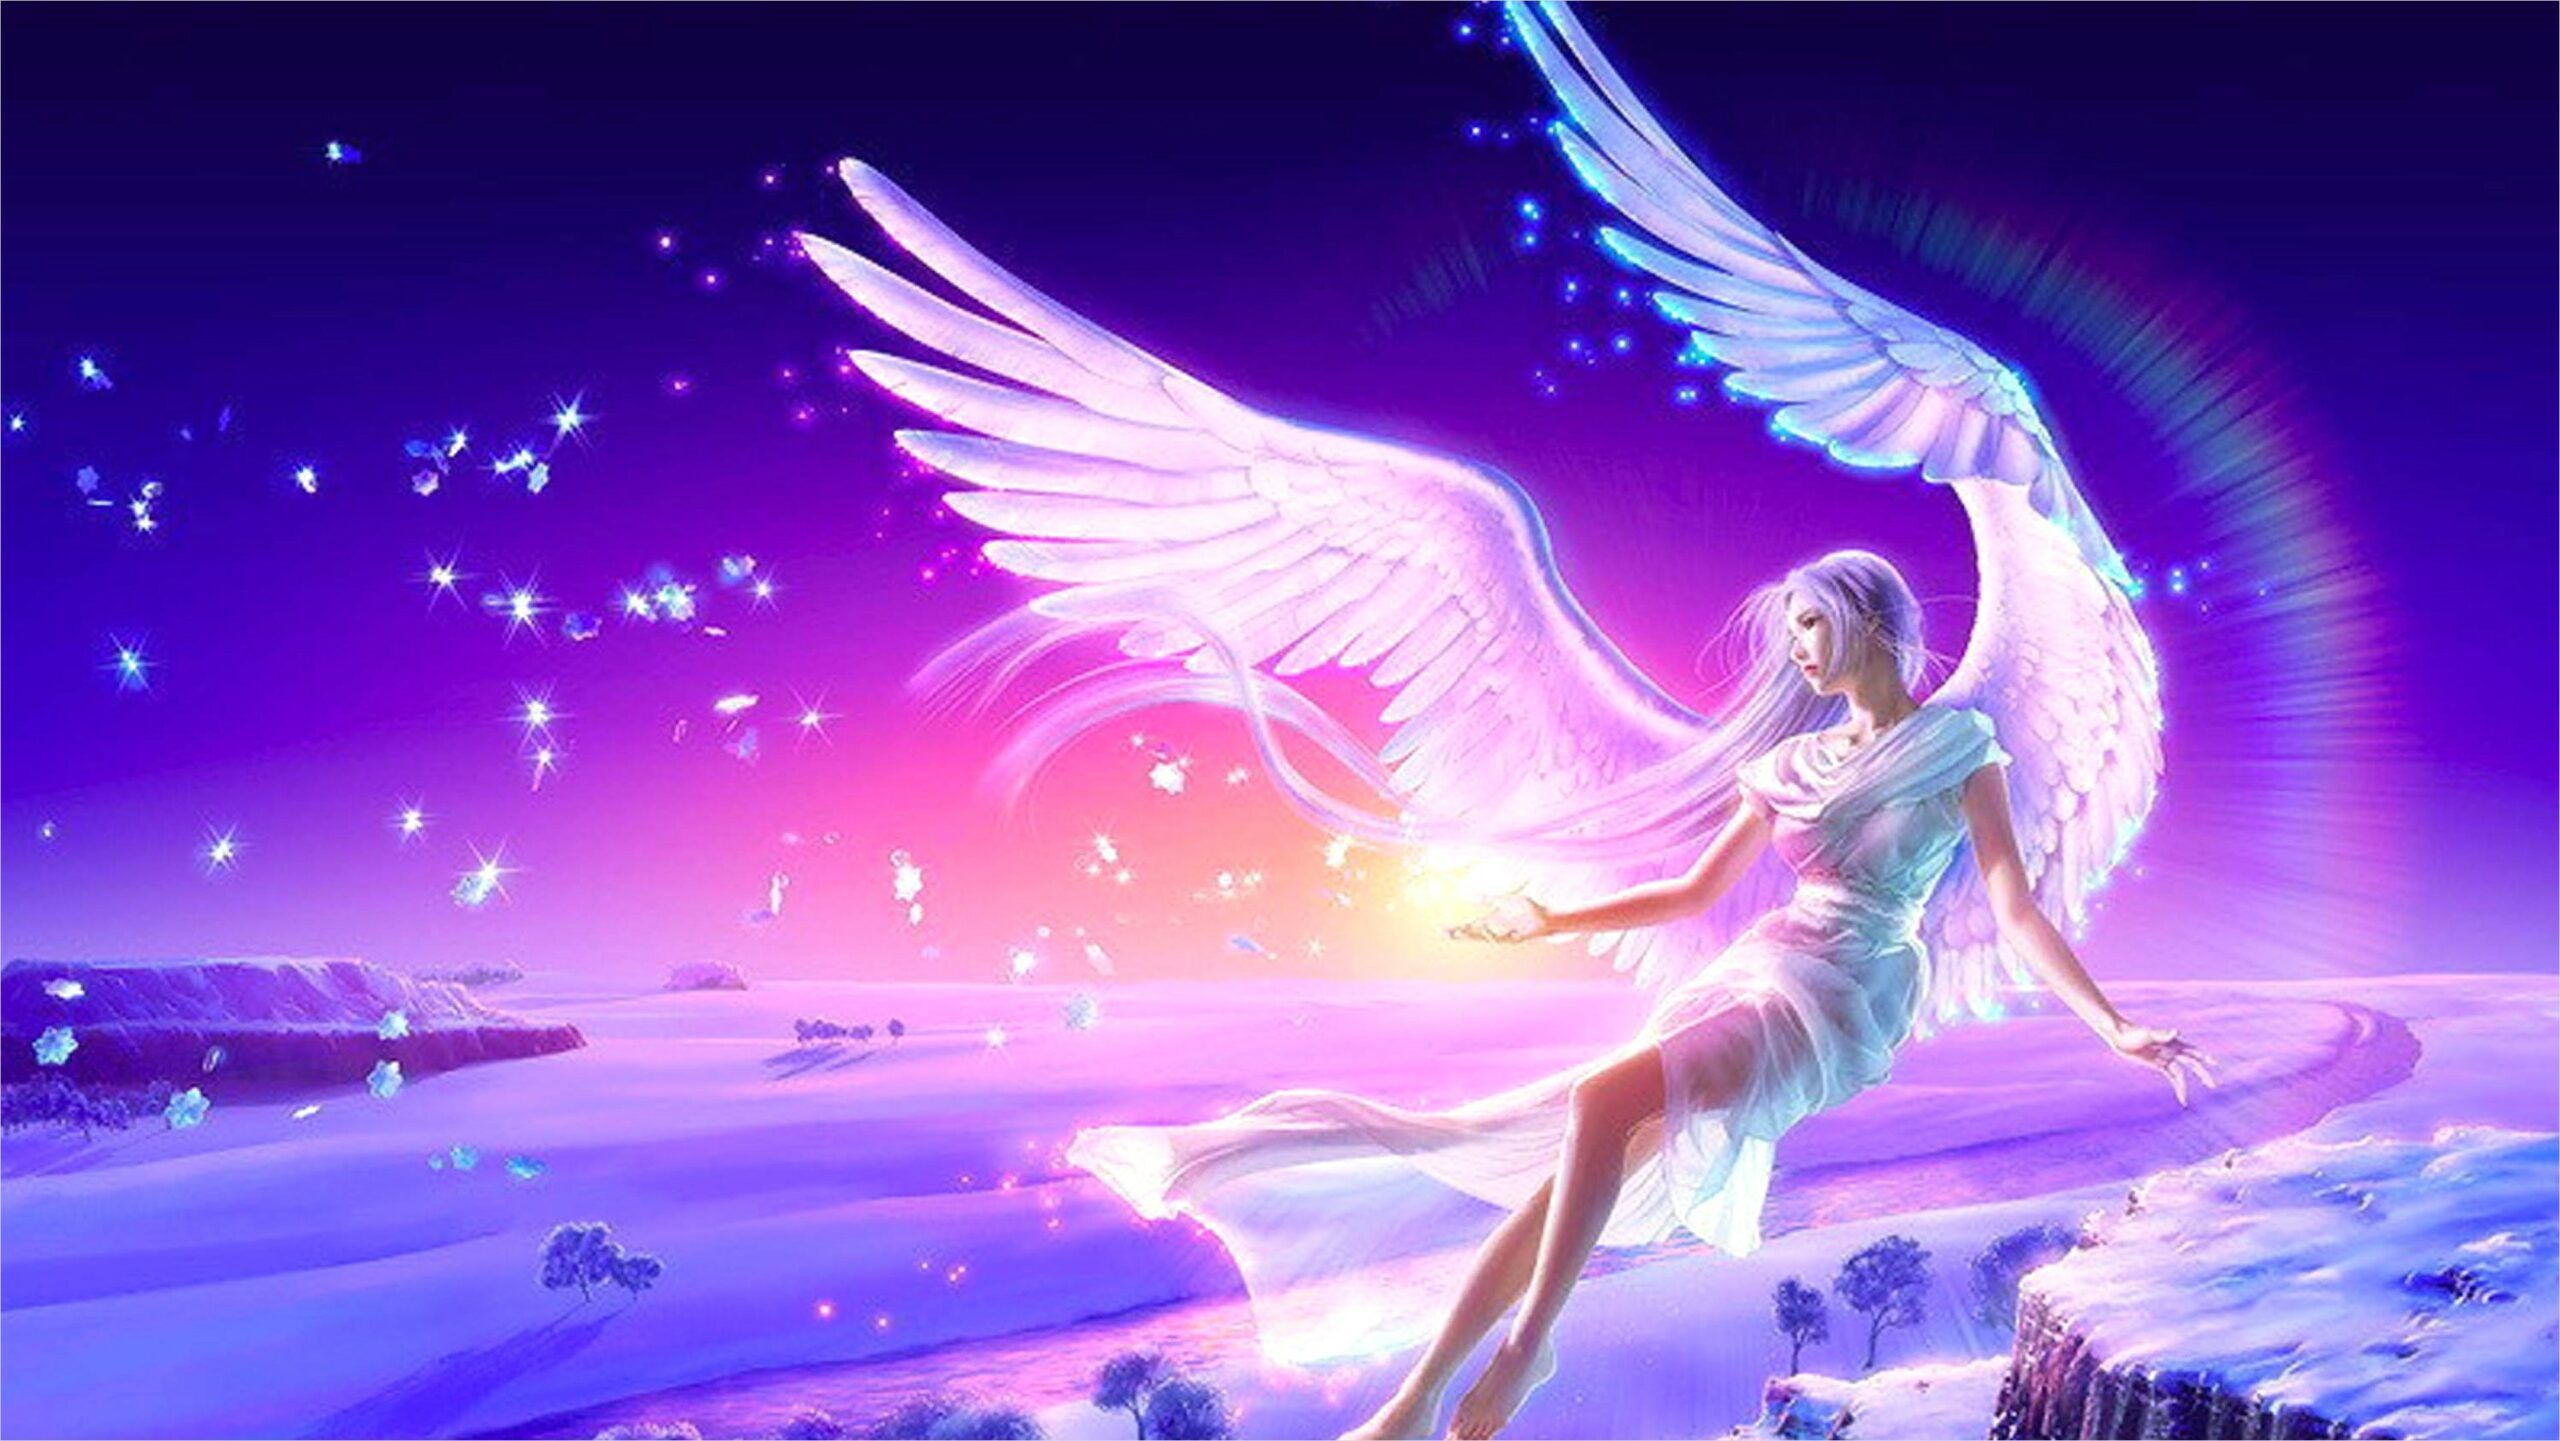 4k Anime Wallpaper Pink Blue In 2020 Angel Wallpaper Beautiful Fantasy Art Anime Wallpaper